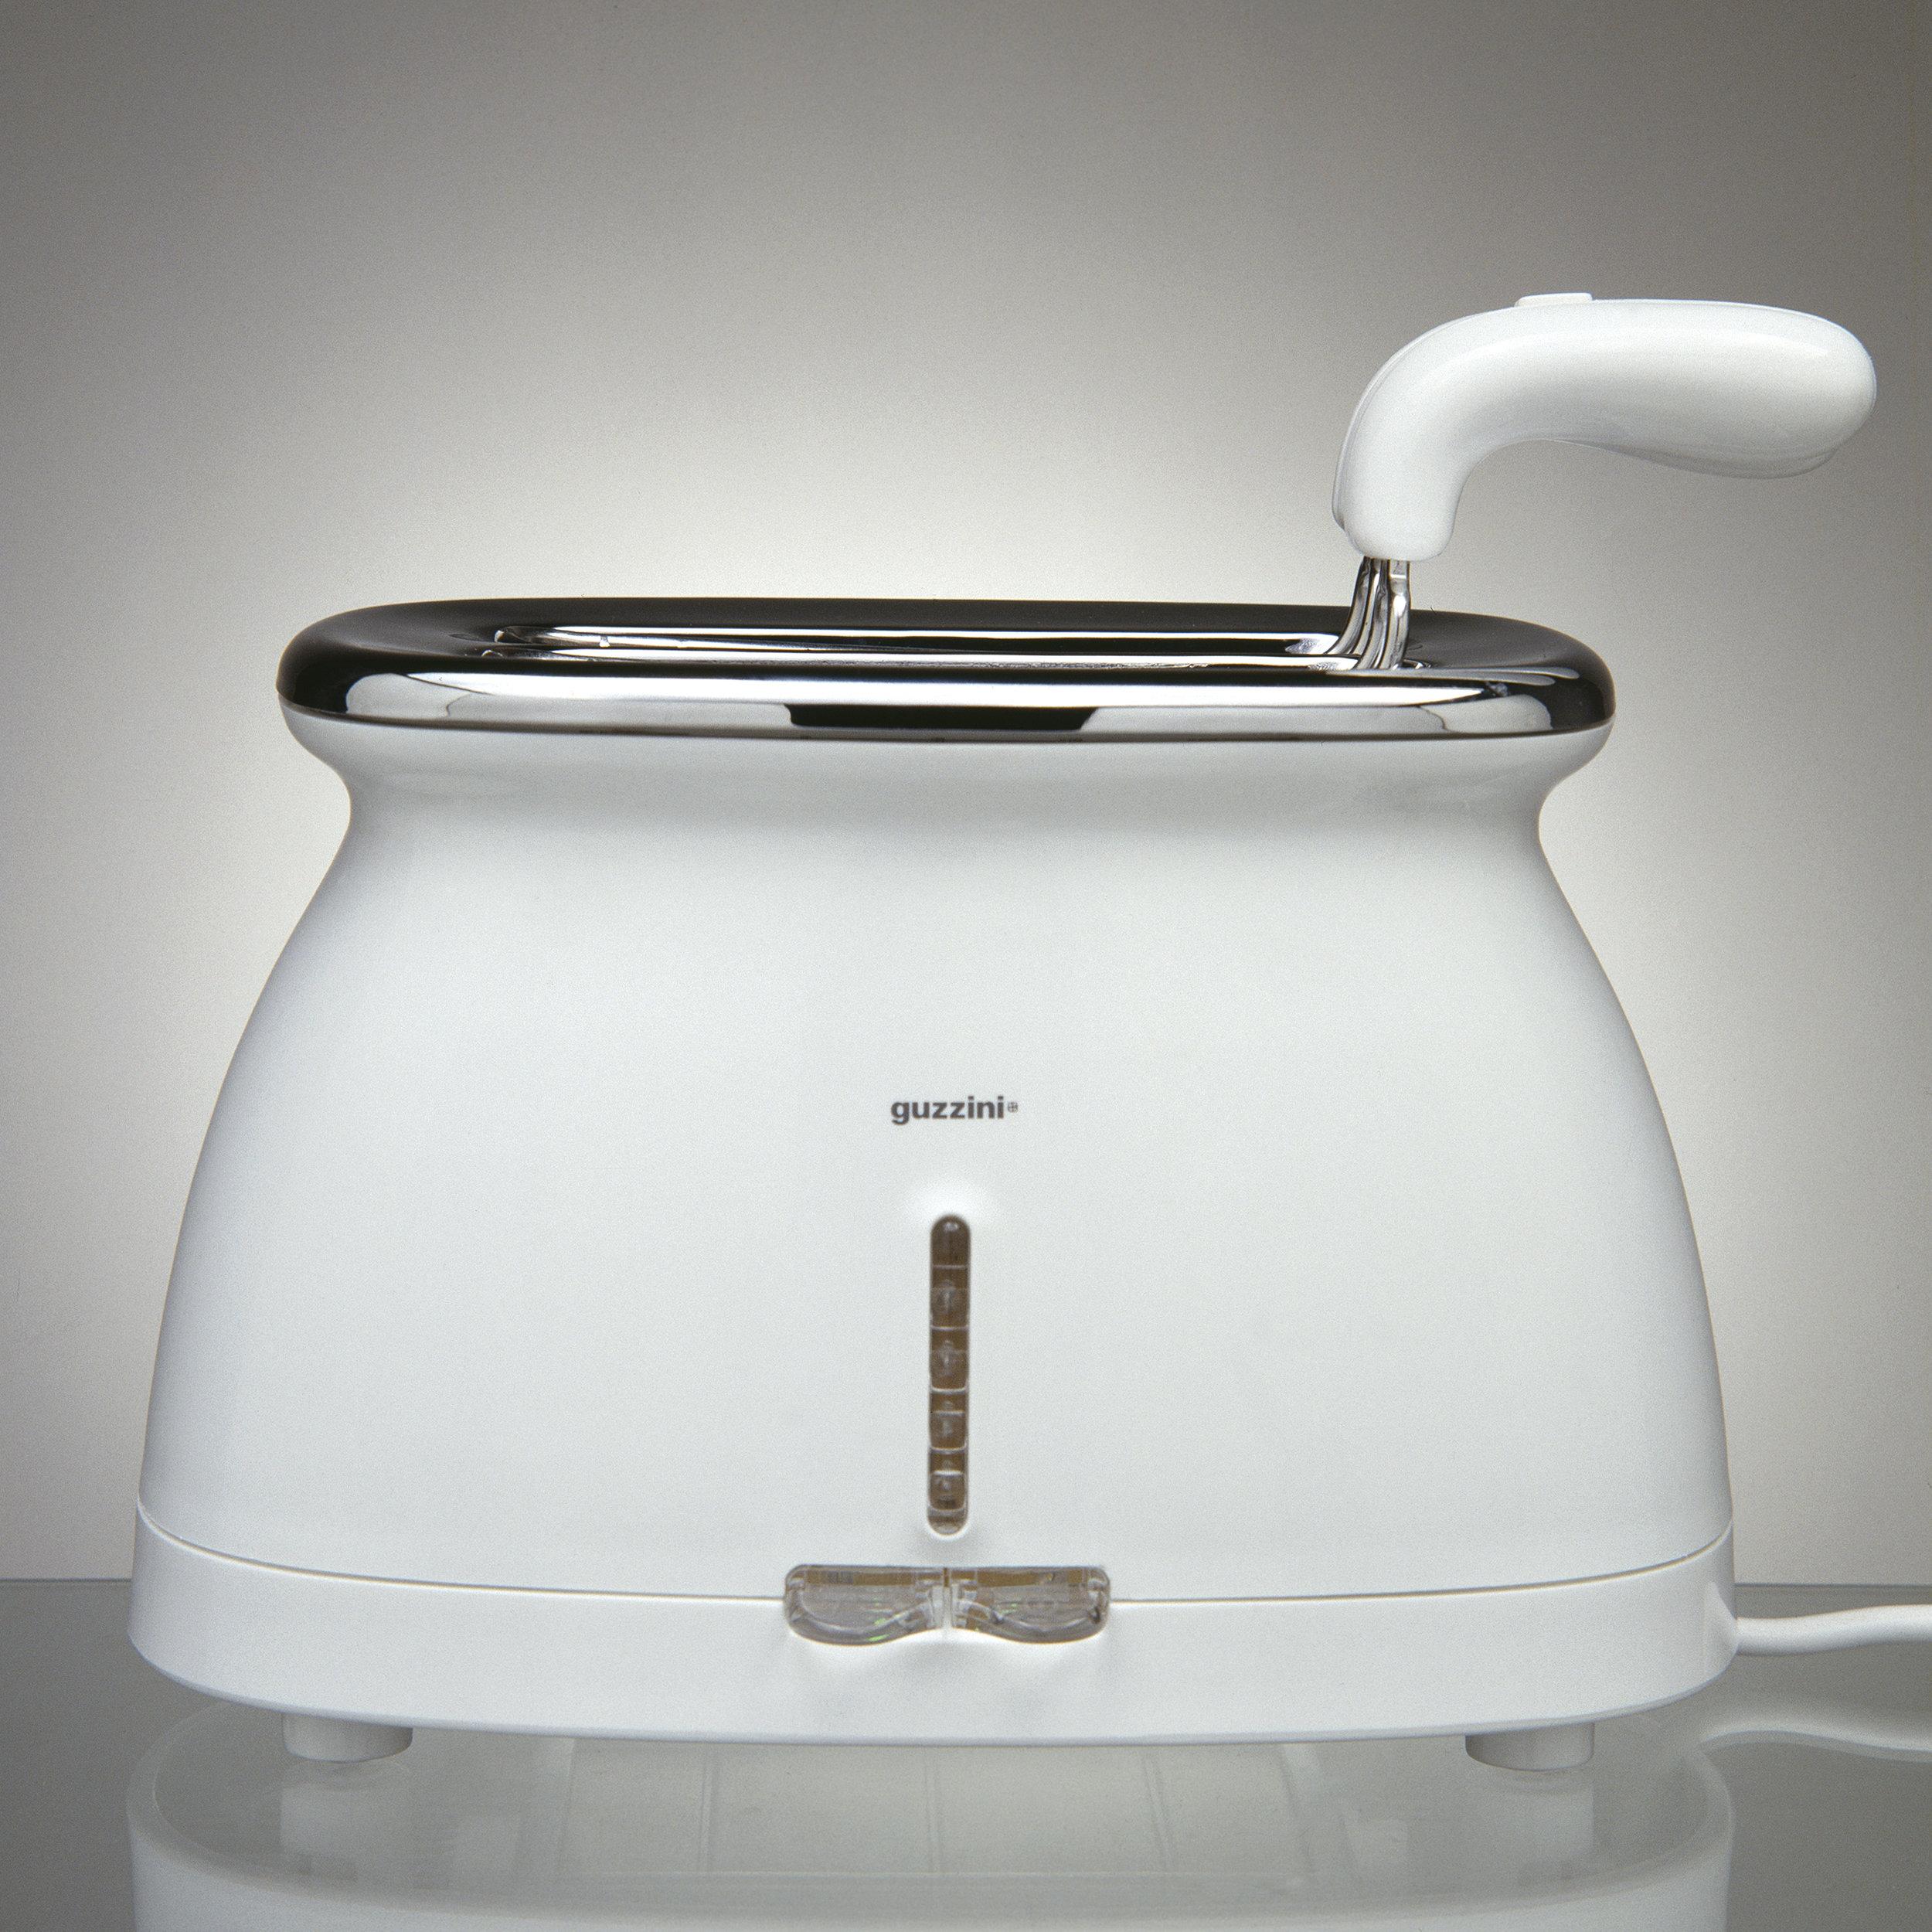 Guzzini_kitchenAppliances_IlvioPhotos_HighRes_004.jpg